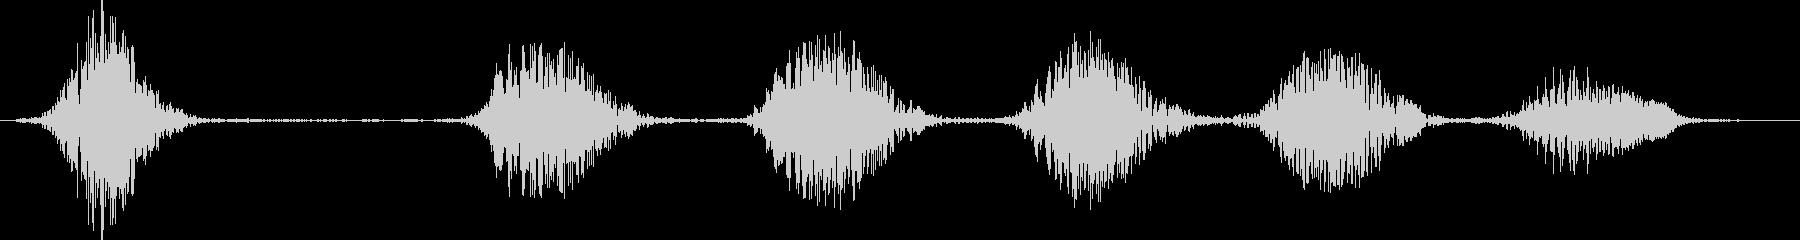 SPANIEL MIX:バーキング...の未再生の波形